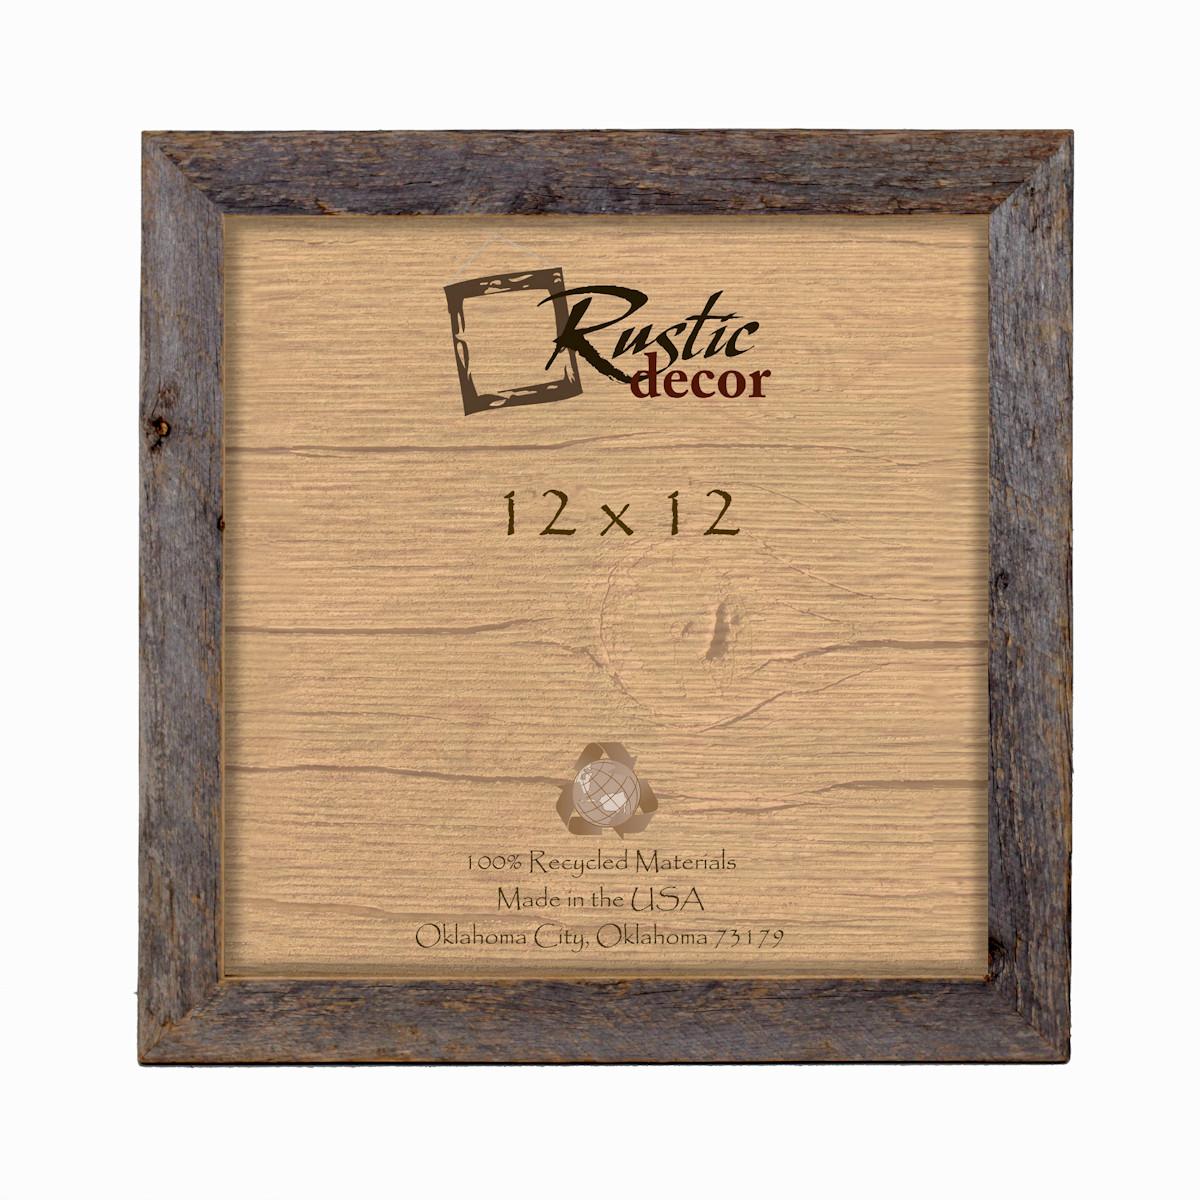 12x12 rustic barn wood